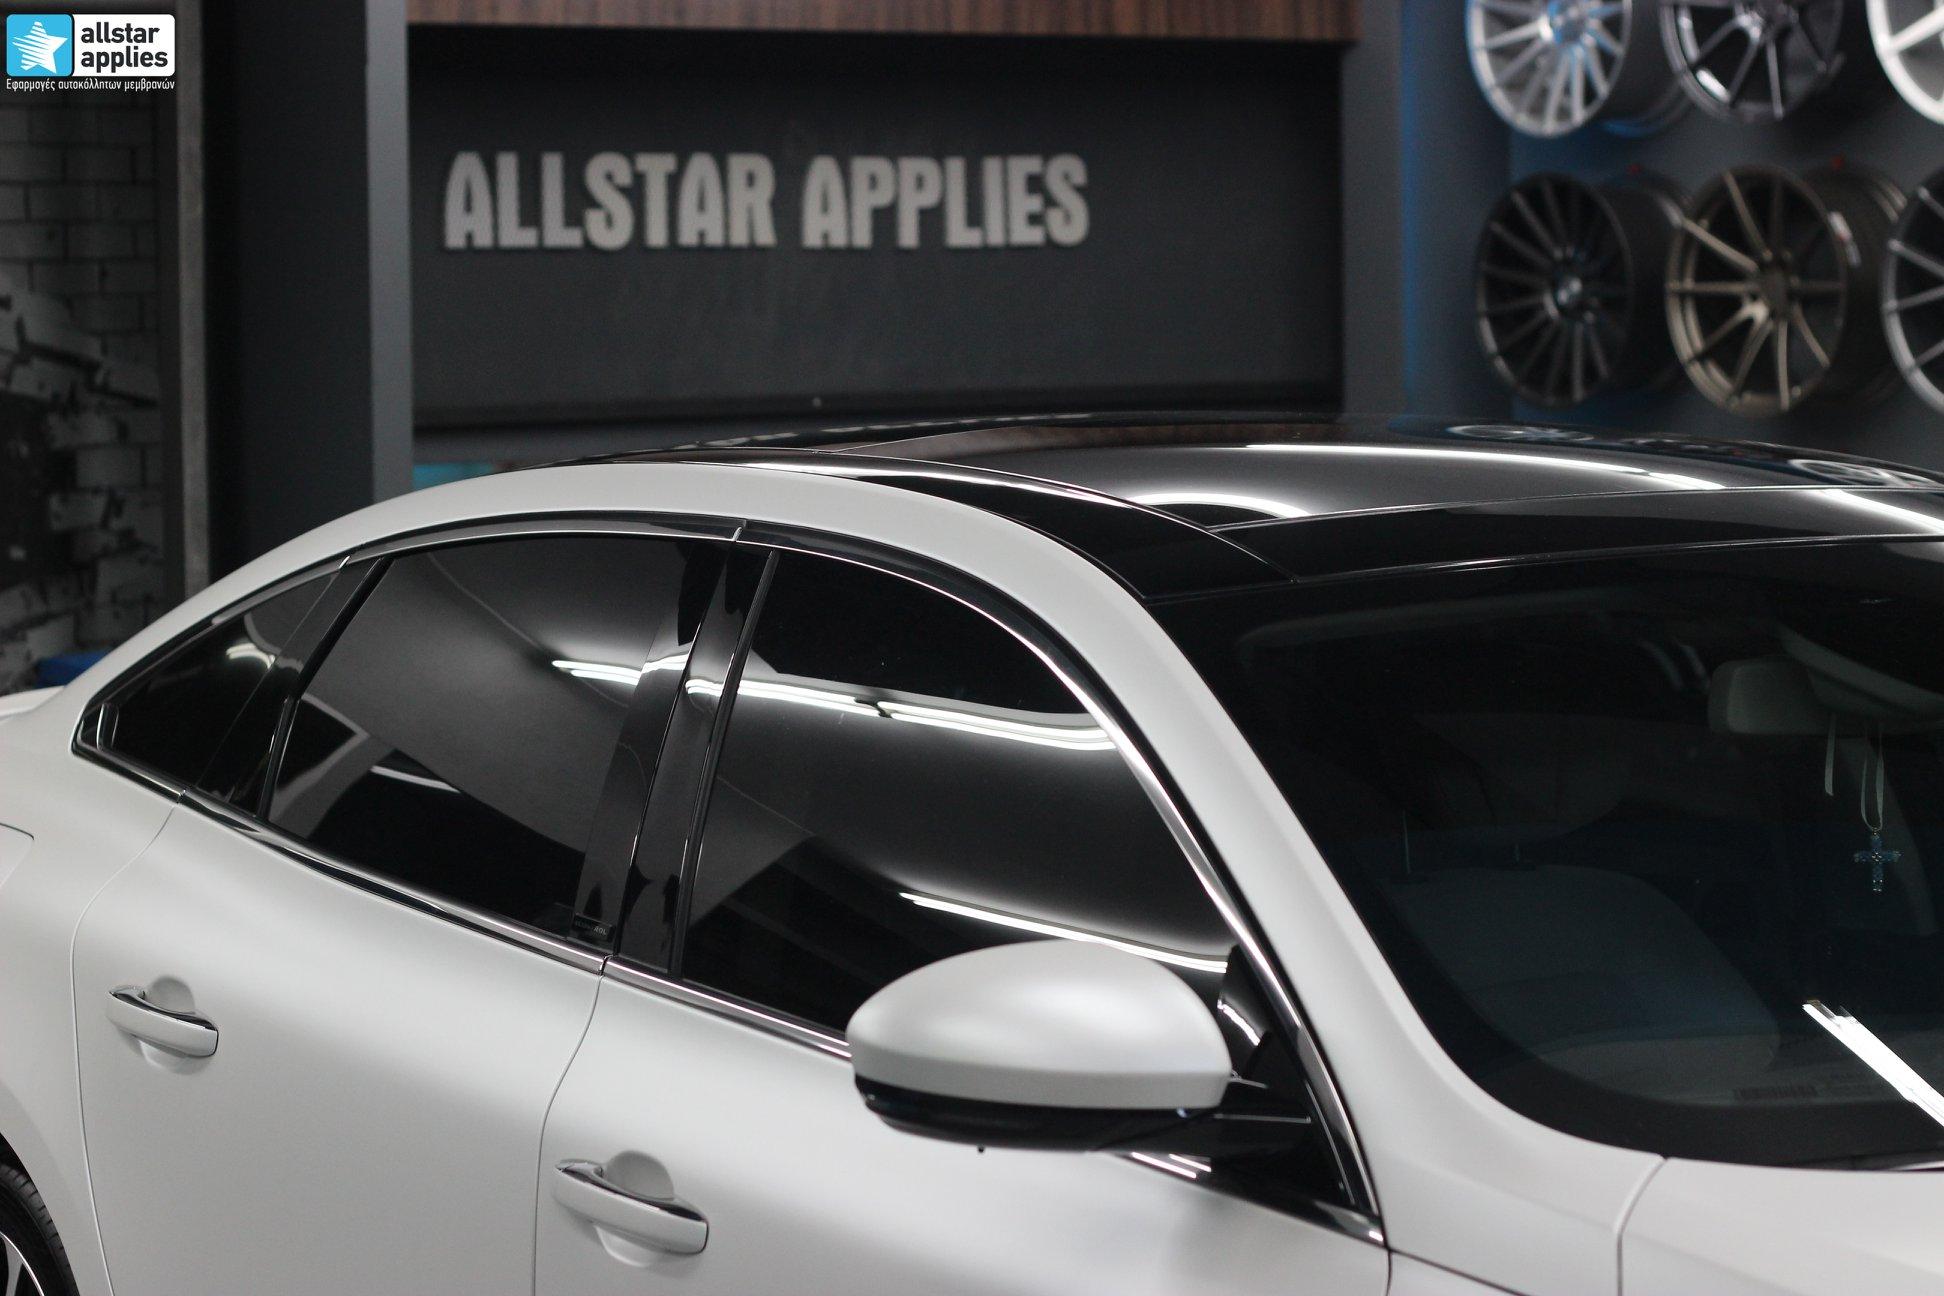 Renault Talisman - Satin Pearl White (7)